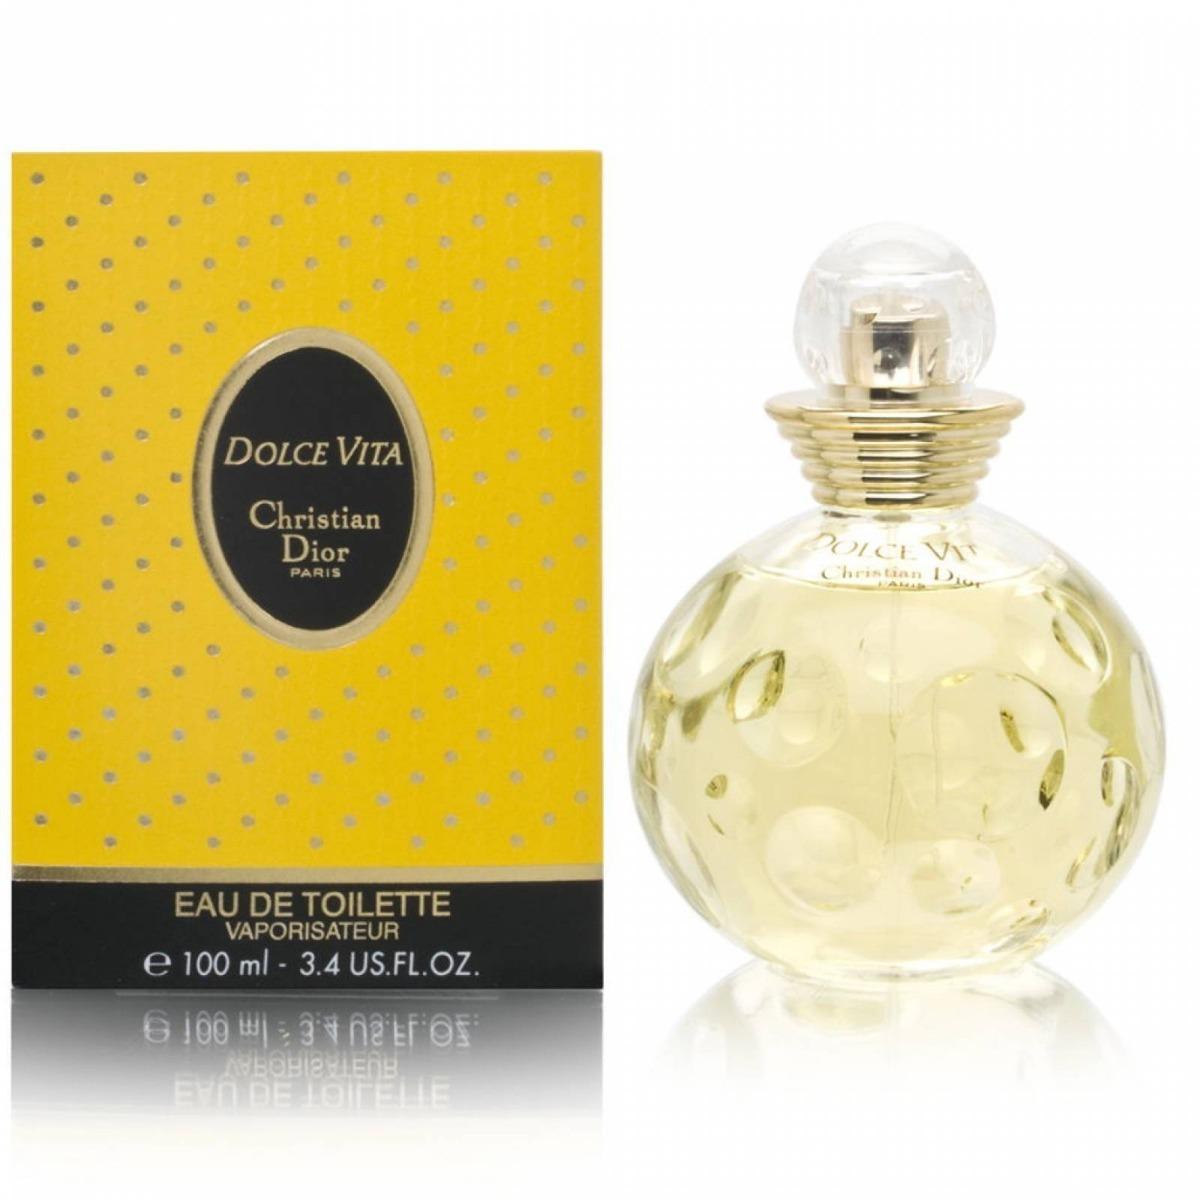 Dolce Vita Parfum Christian Dior Para Damas